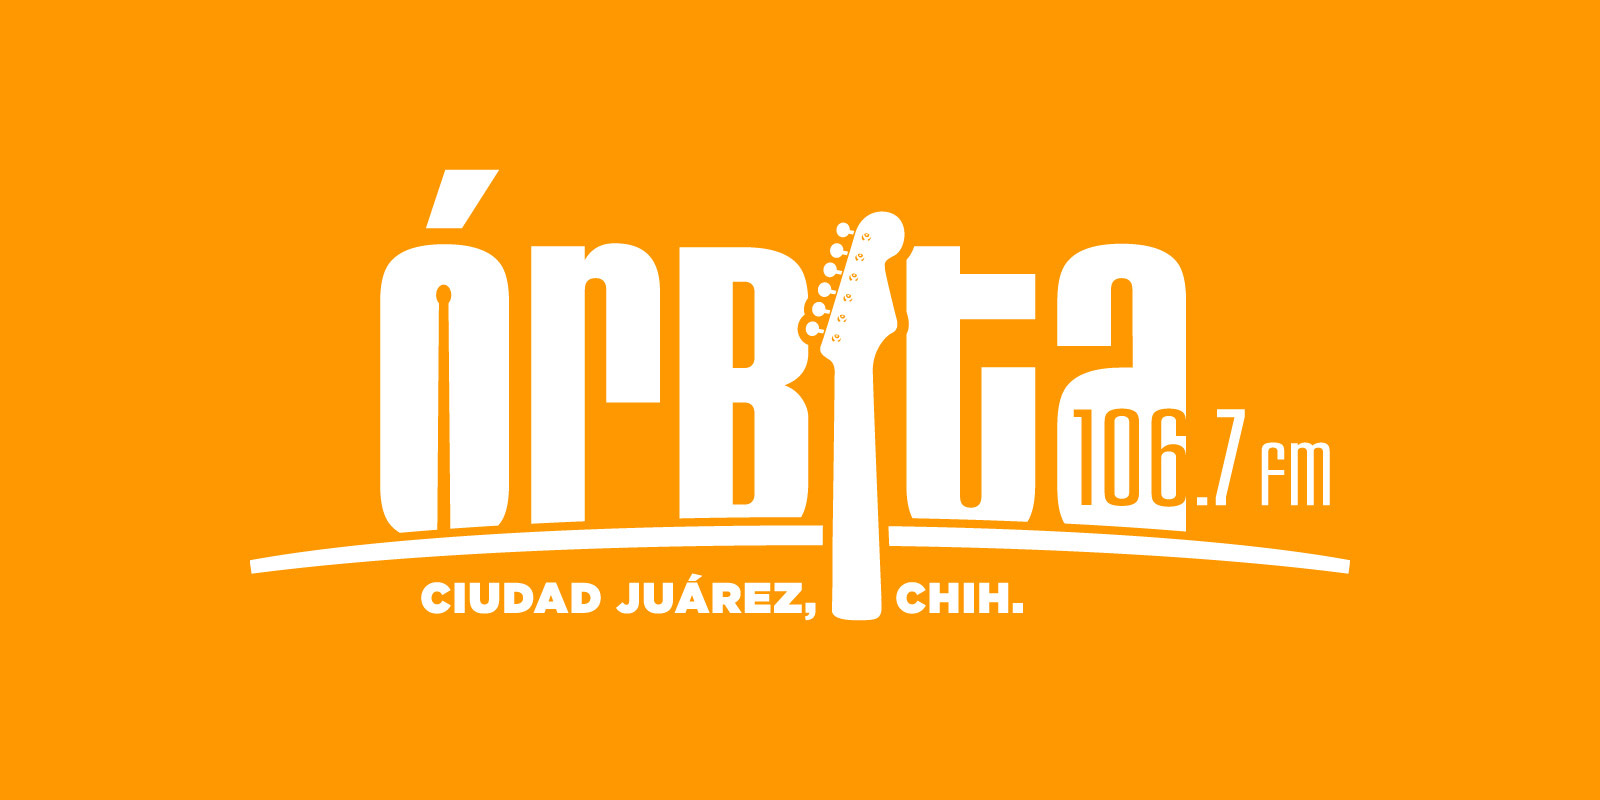 Orbita 106.7 FM, Ciudad Juarez, Chihuahua